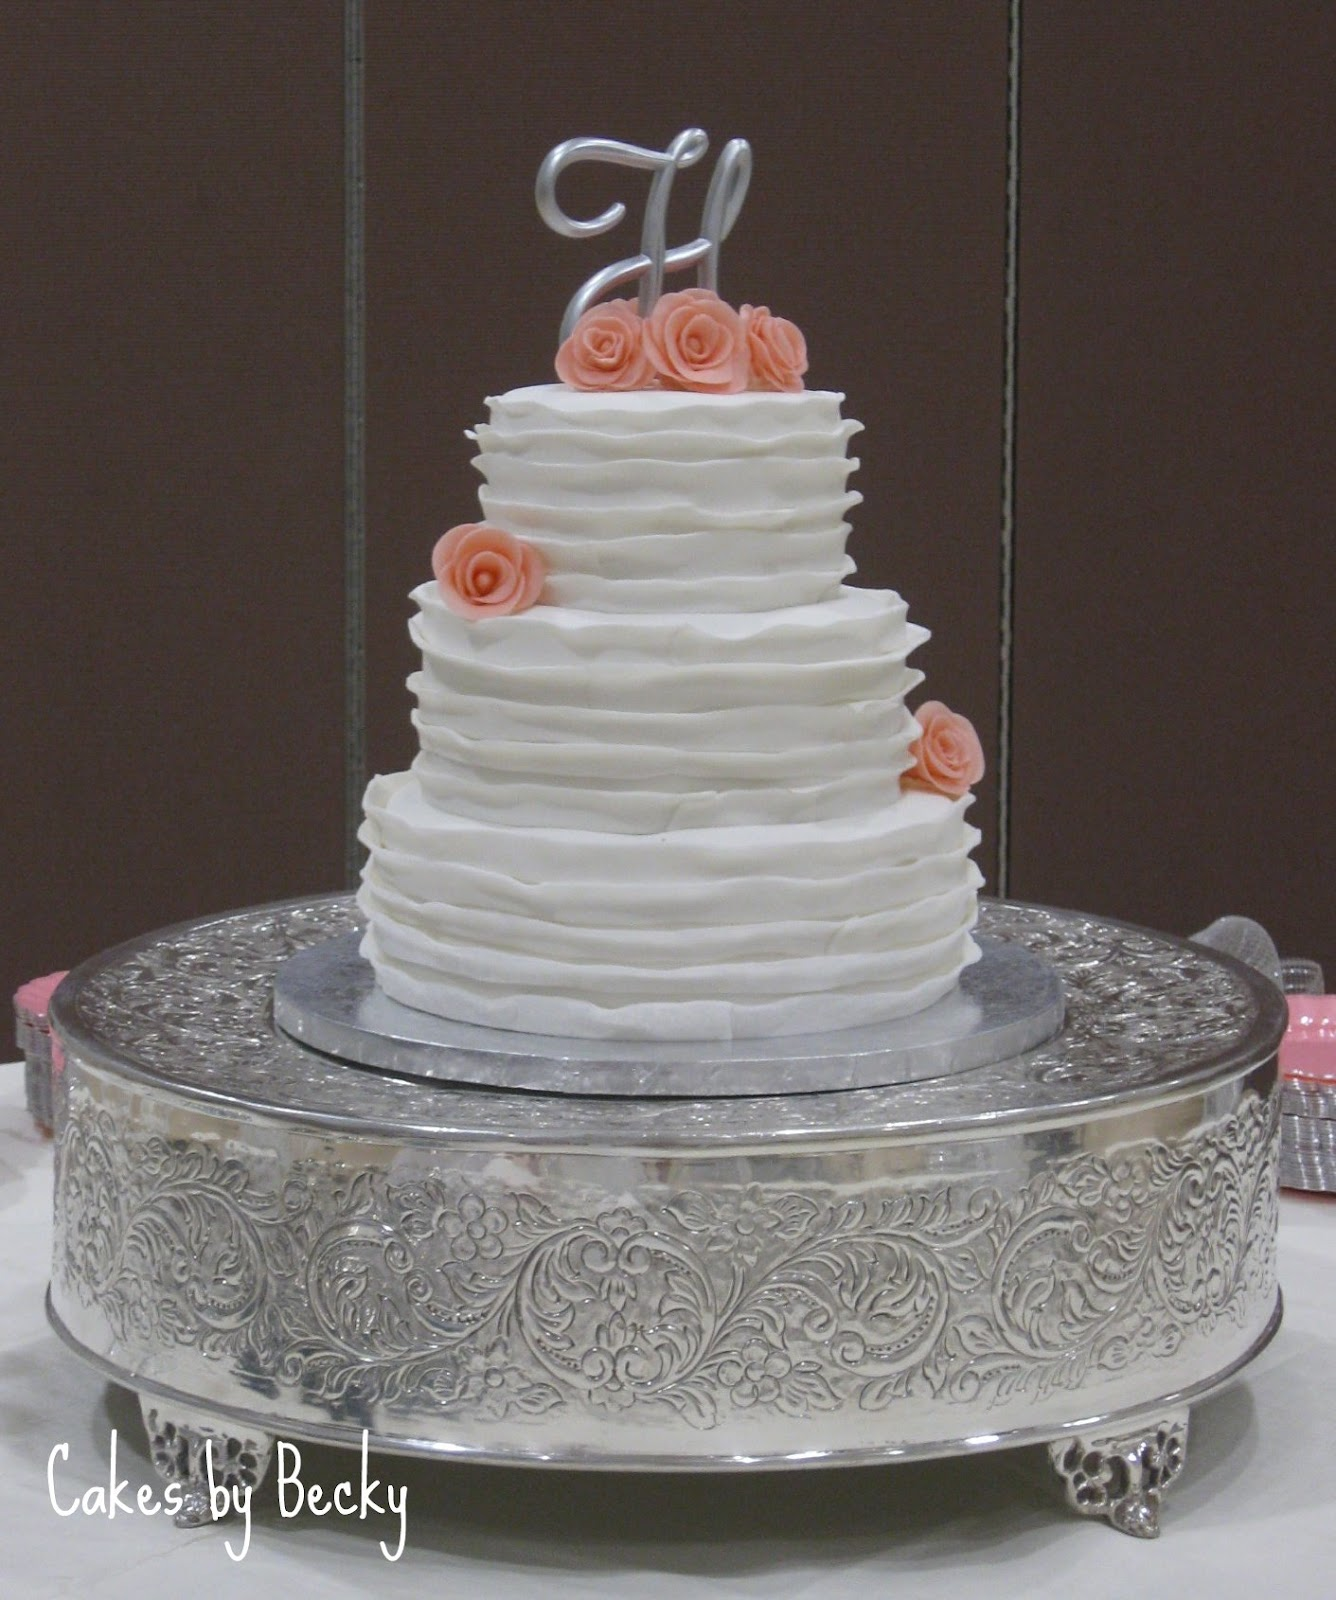 Cakes by Becky: White Ruffled Wedding Cake